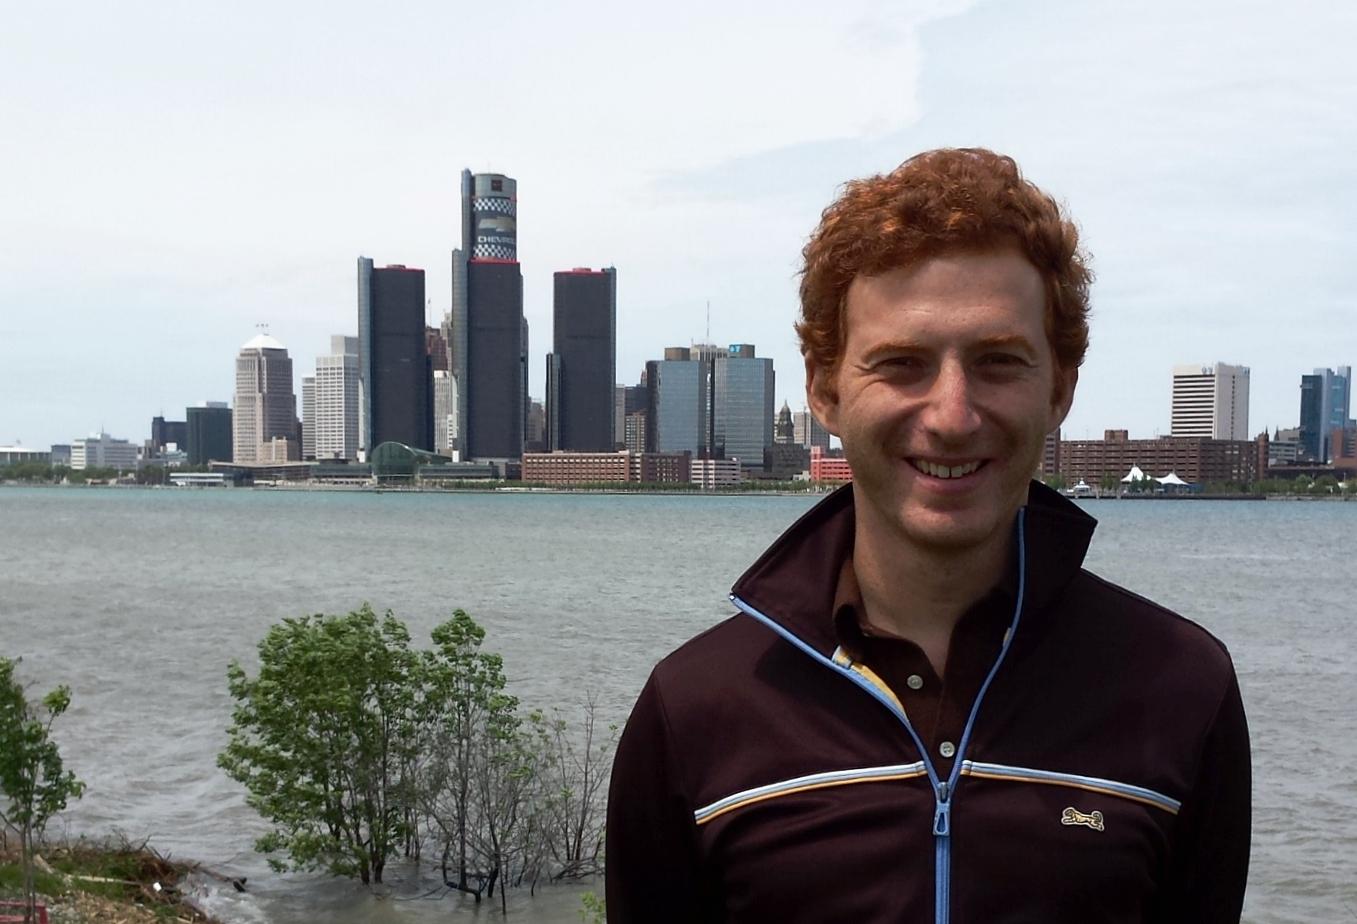 Journalist Ryan Goldberg, photographed against the Detroit skyline